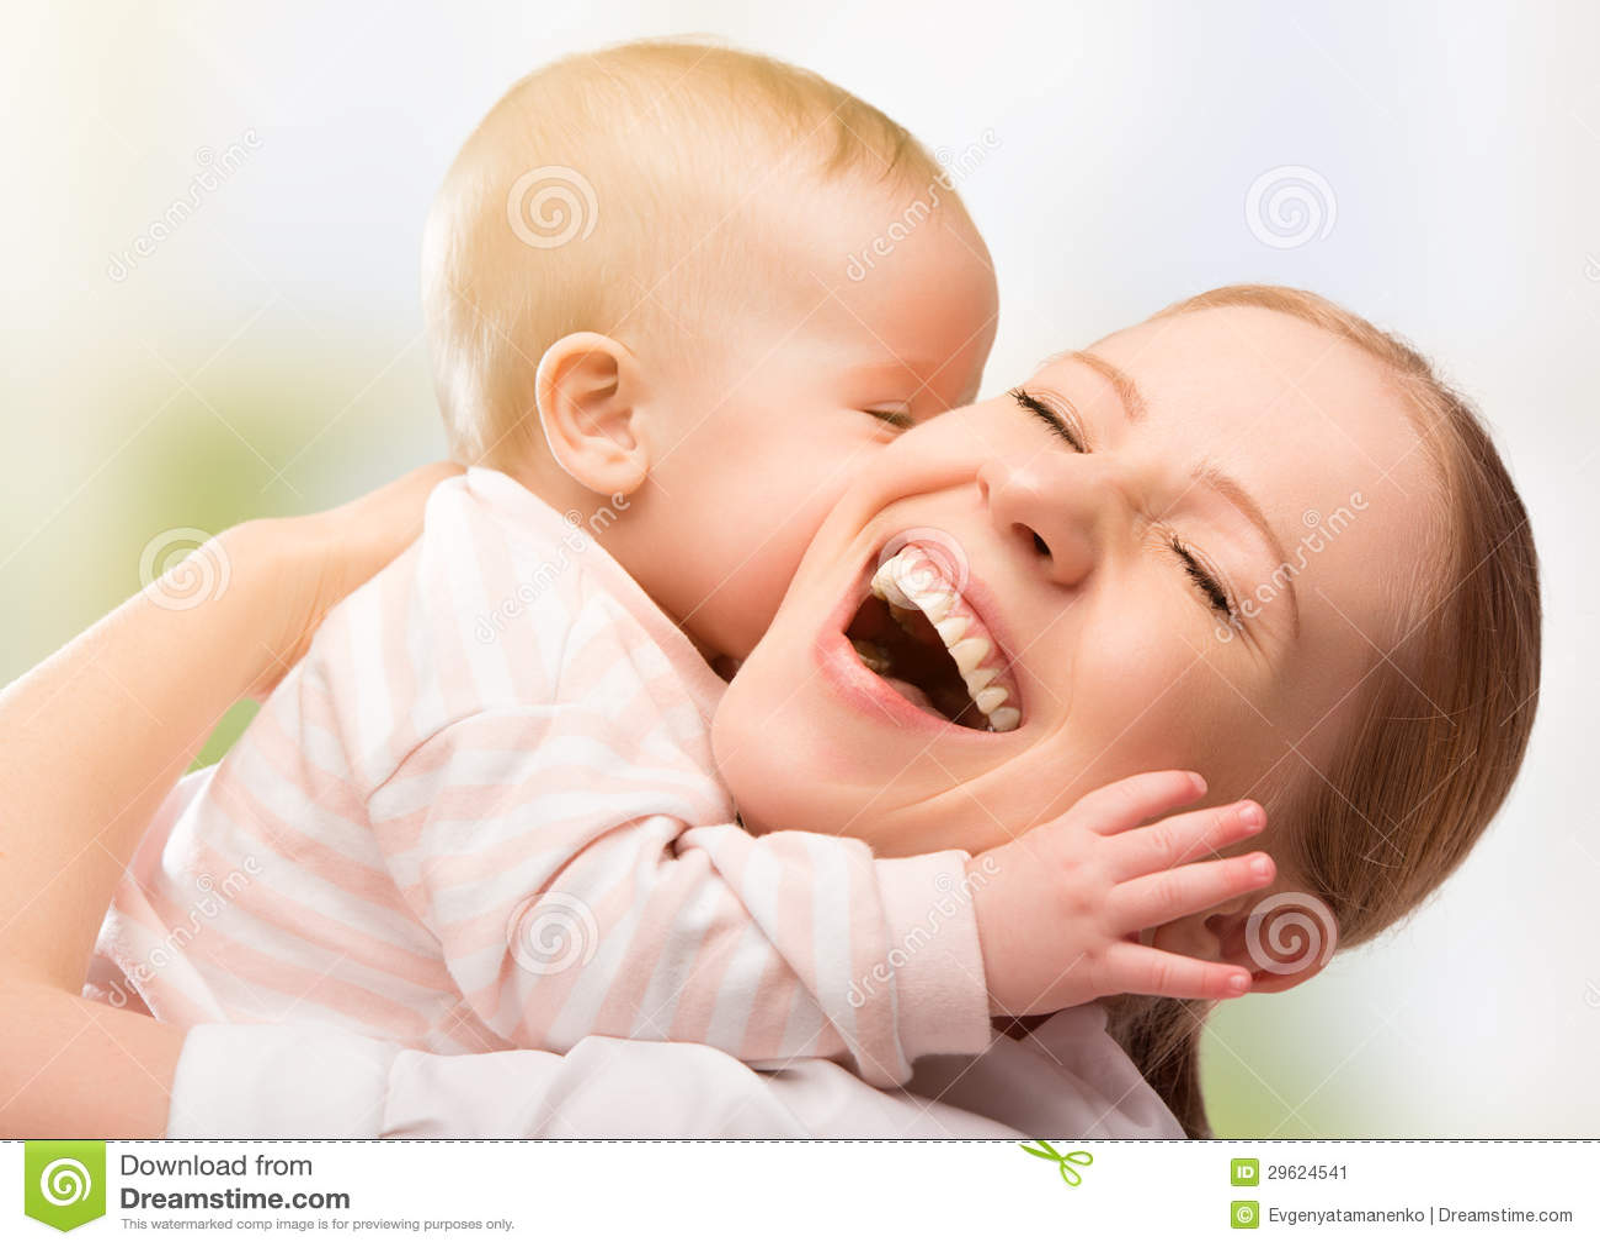 Família alegre feliz. Beijo da matriz e do bebê